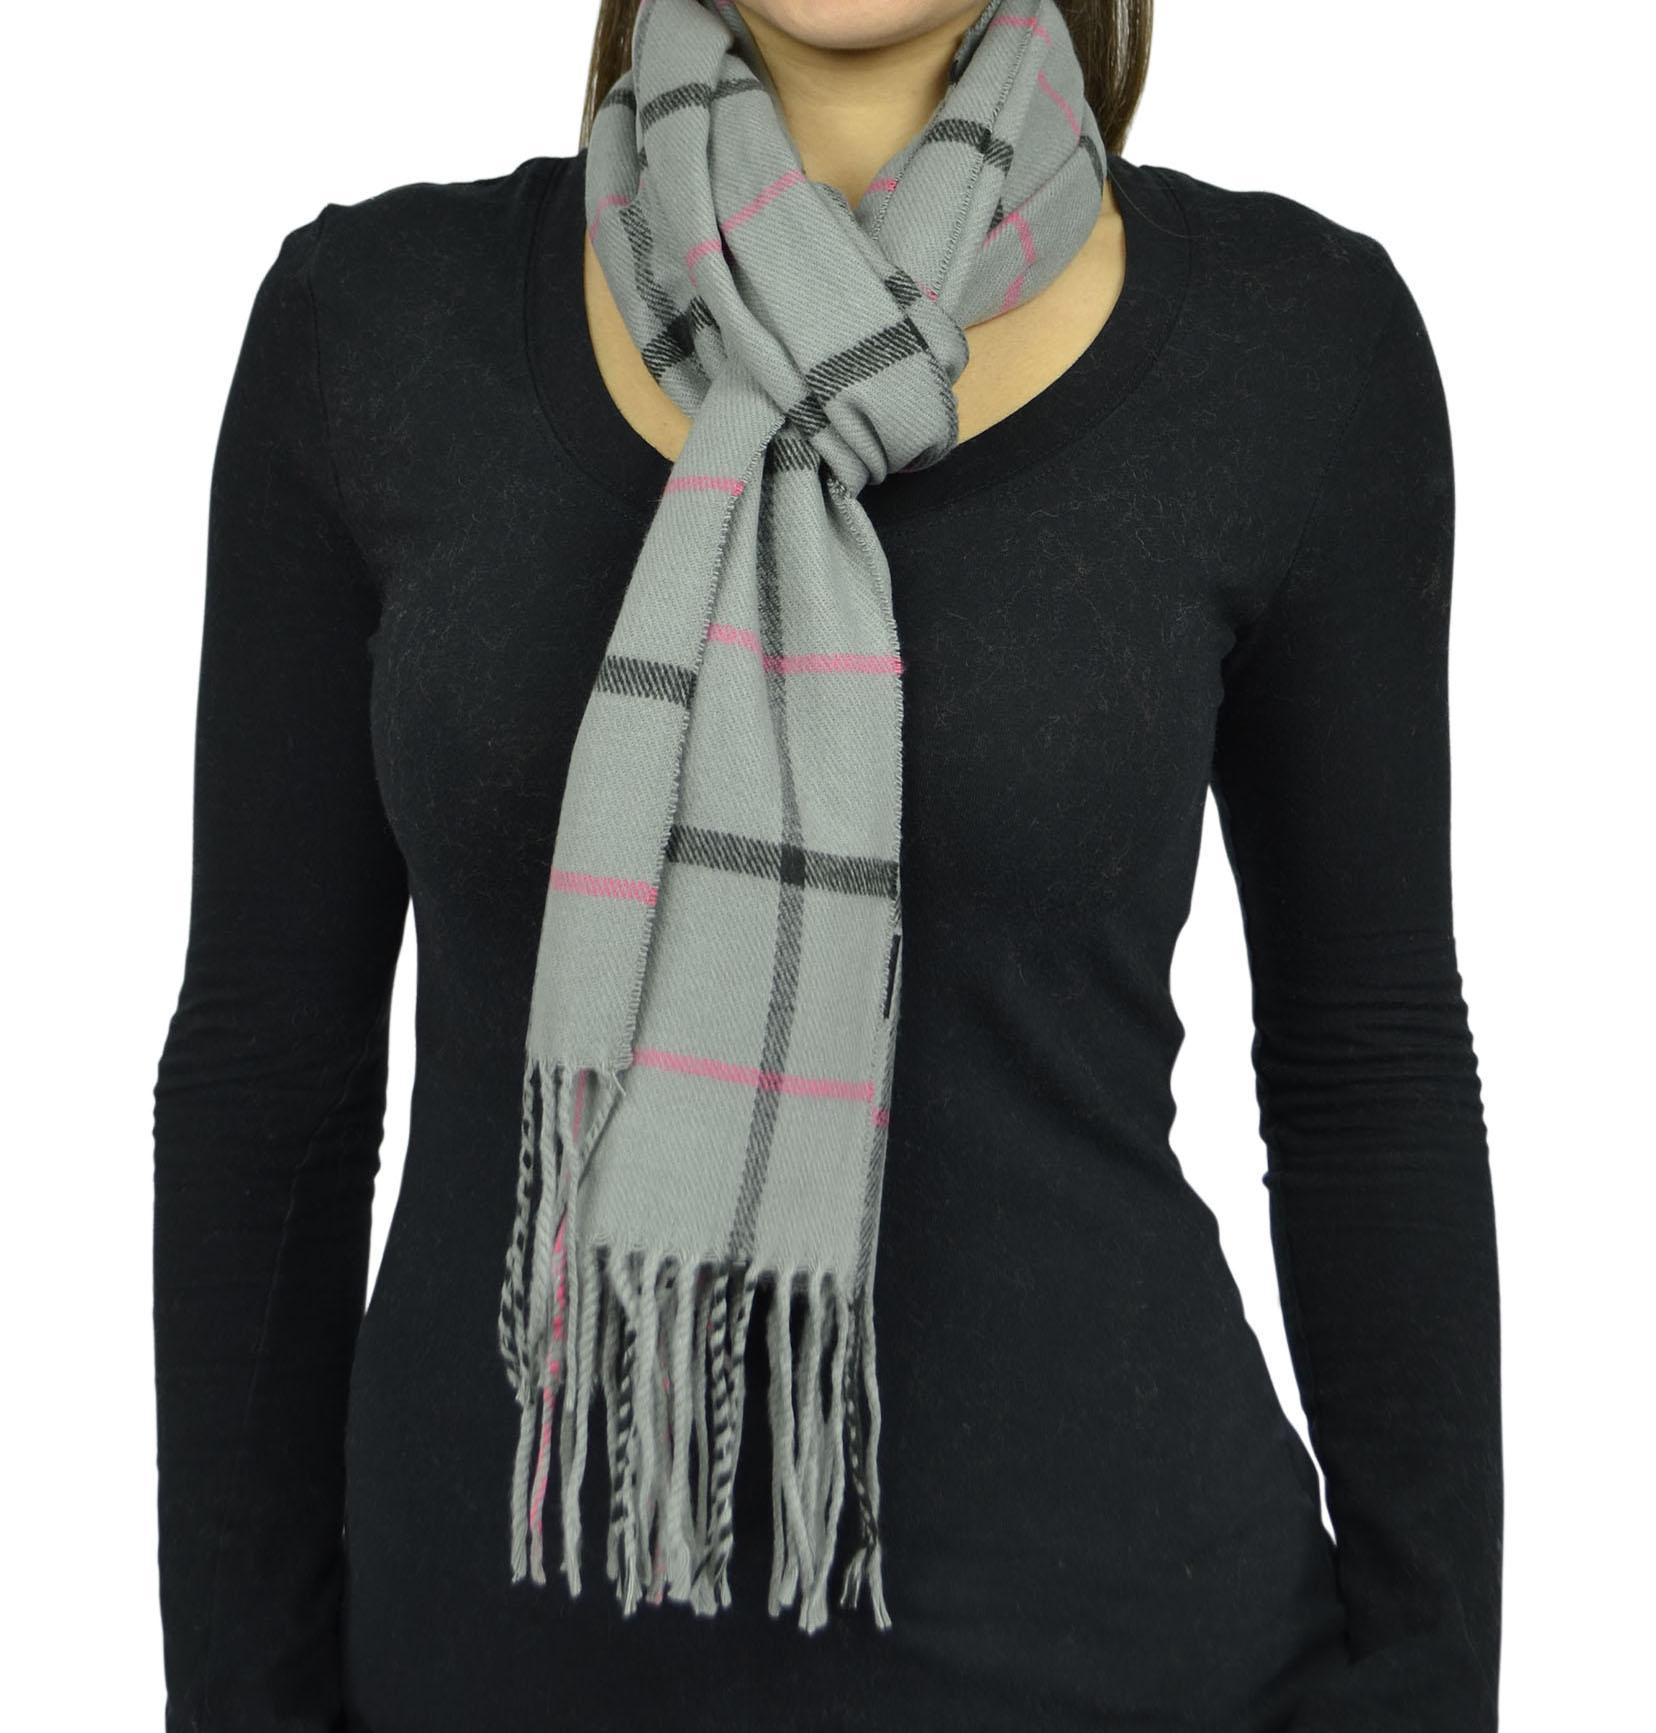 Belle Donne- Unisex Cashmere Feel Scarf - Plaid / Warm Winter Fashion Scarves - Gray